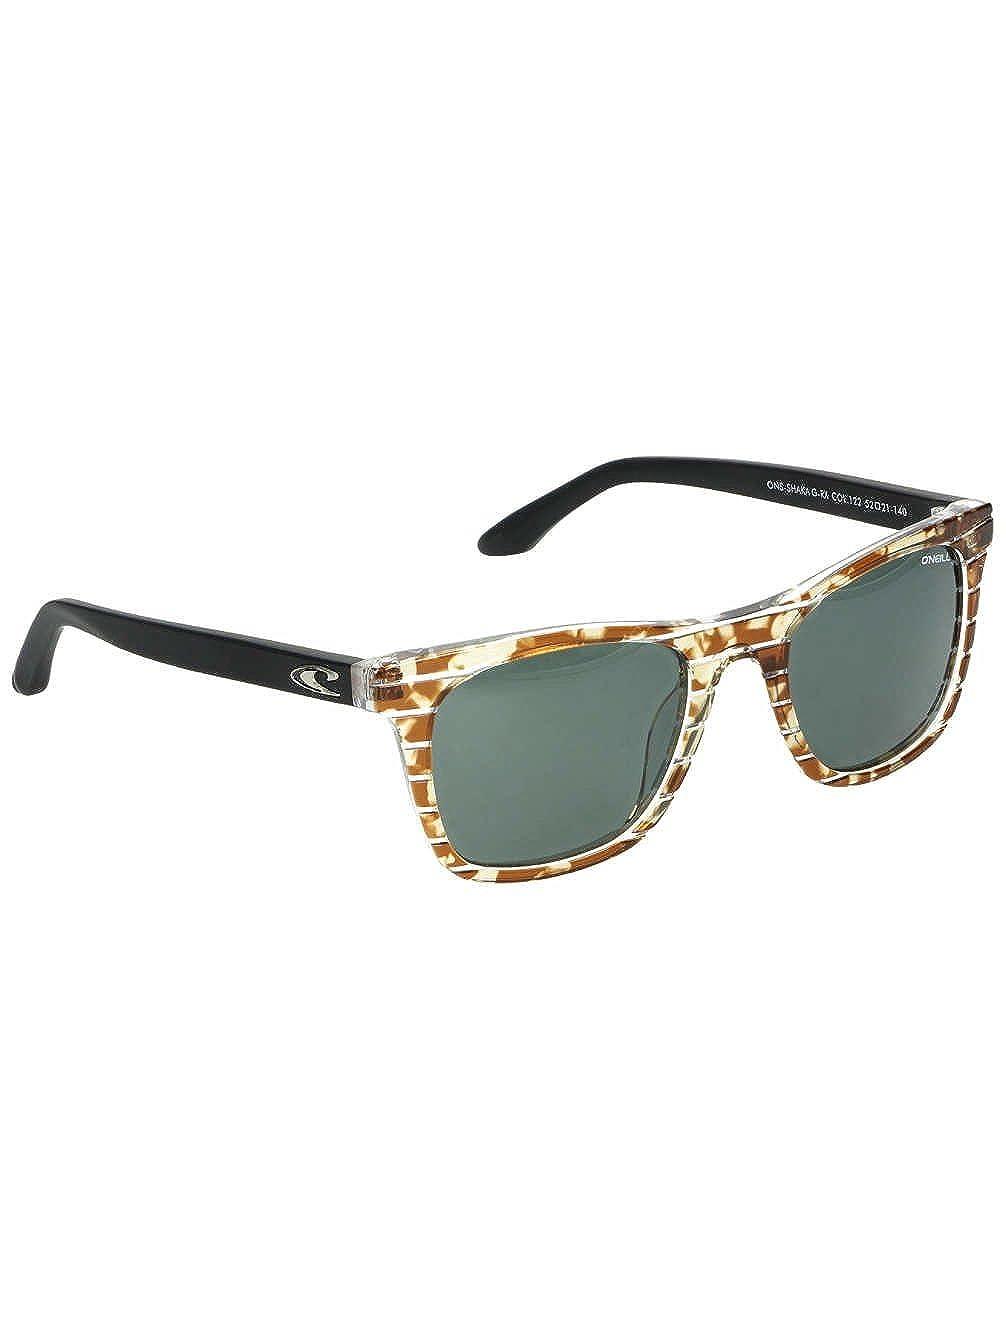 ONeill Eyewear - Gafas de sol - para hombre marrón talla única ...